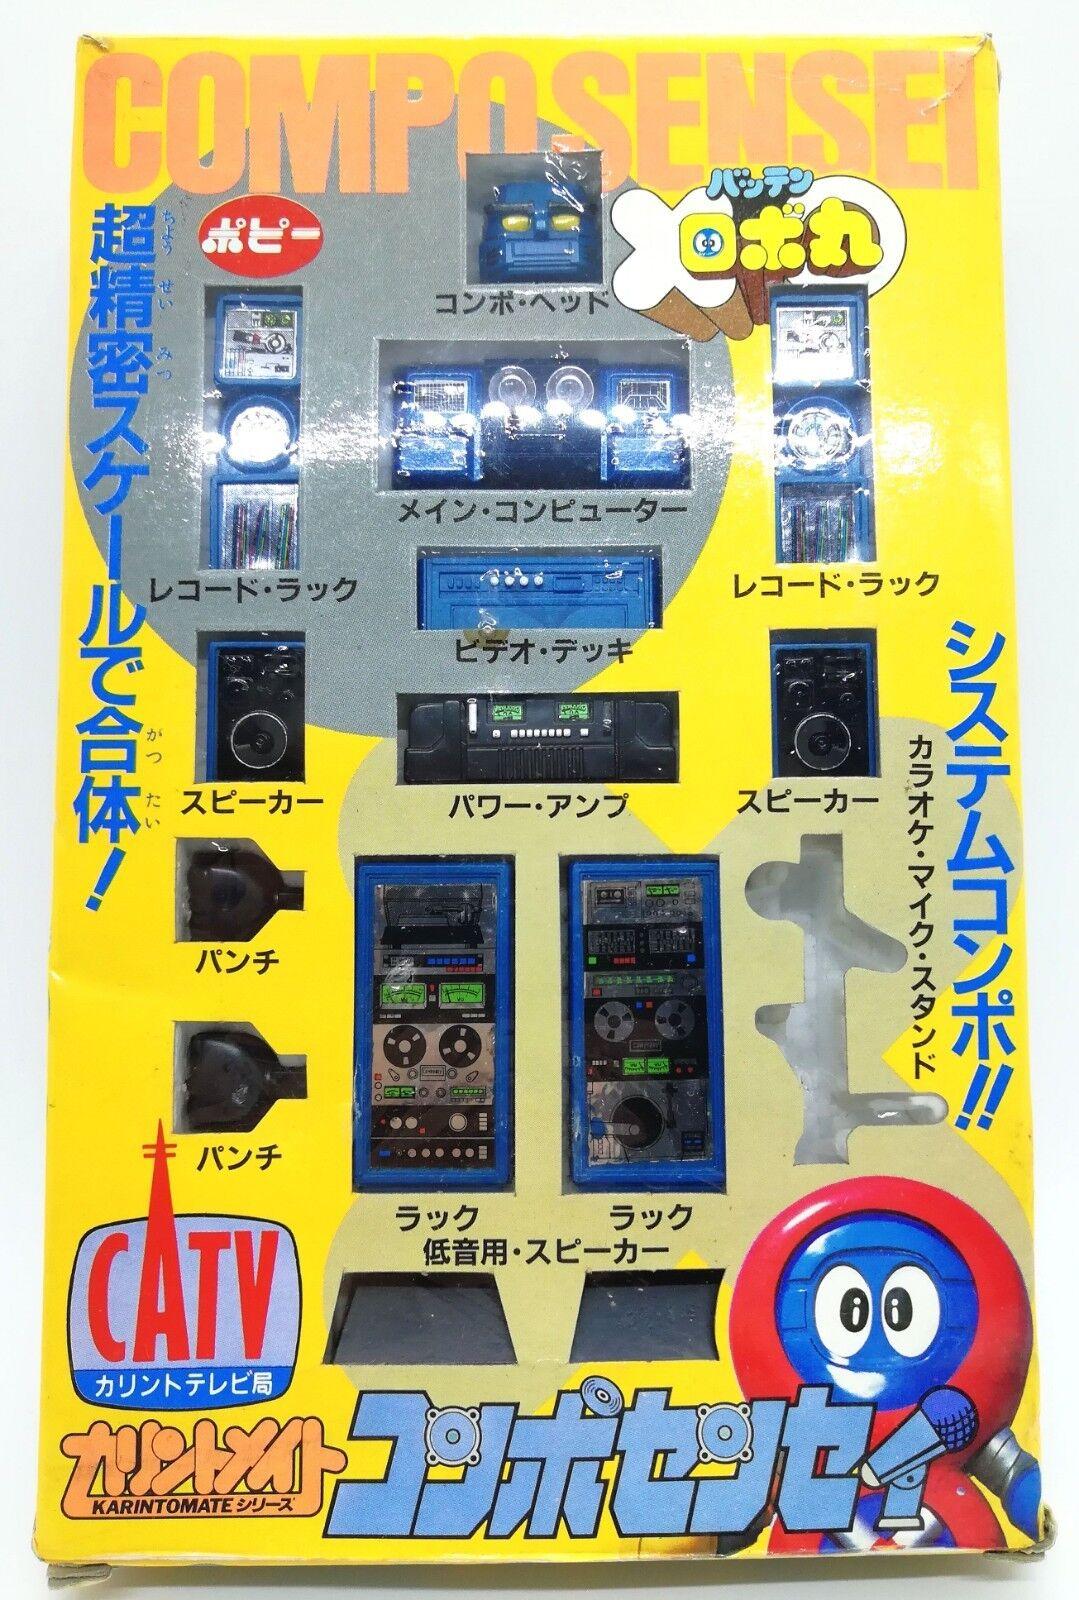 Robot Robomaru Teacher Compo Sensei Karinto Mate Figure Dolls Popy 1983 Rare